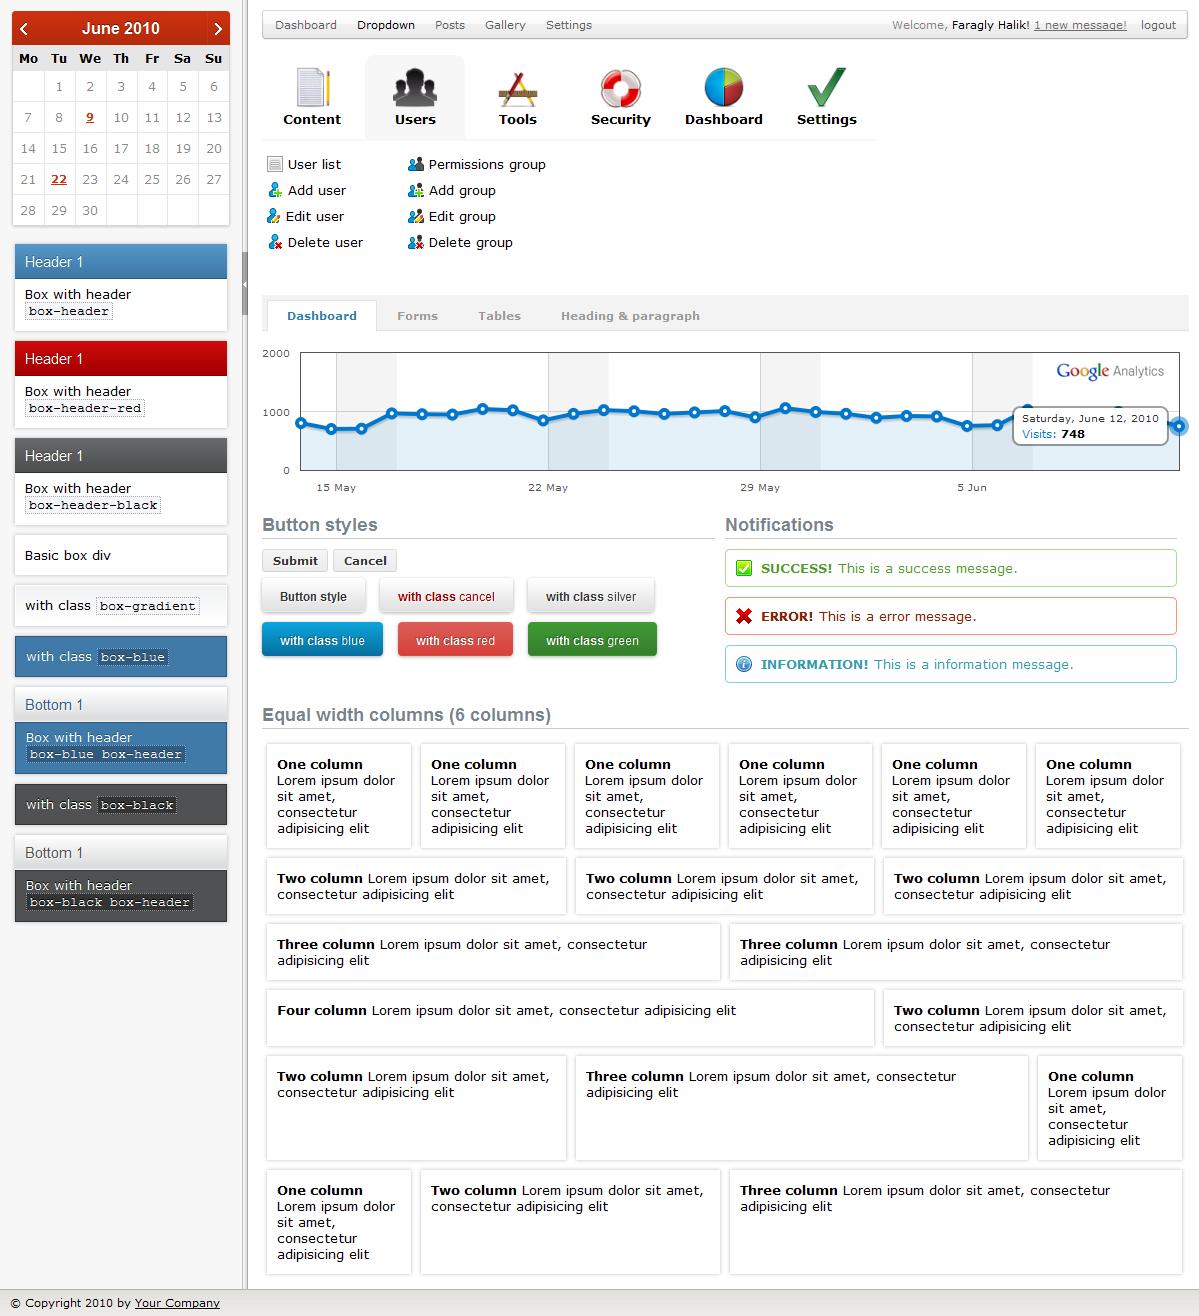 Karamel Admin - Screenshot of Dashboard page